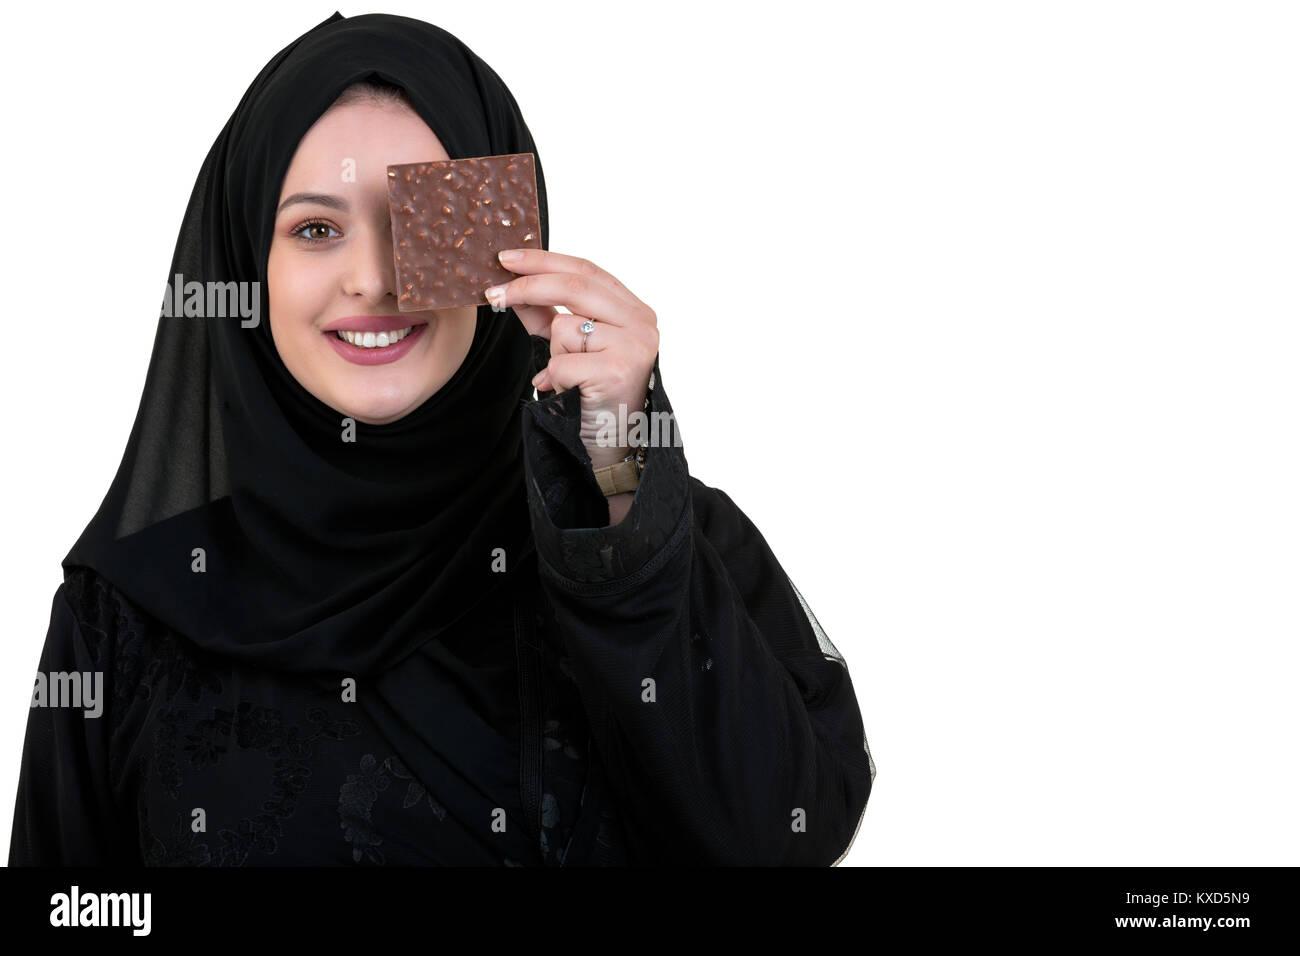 Muslim girl and christian boy hookup